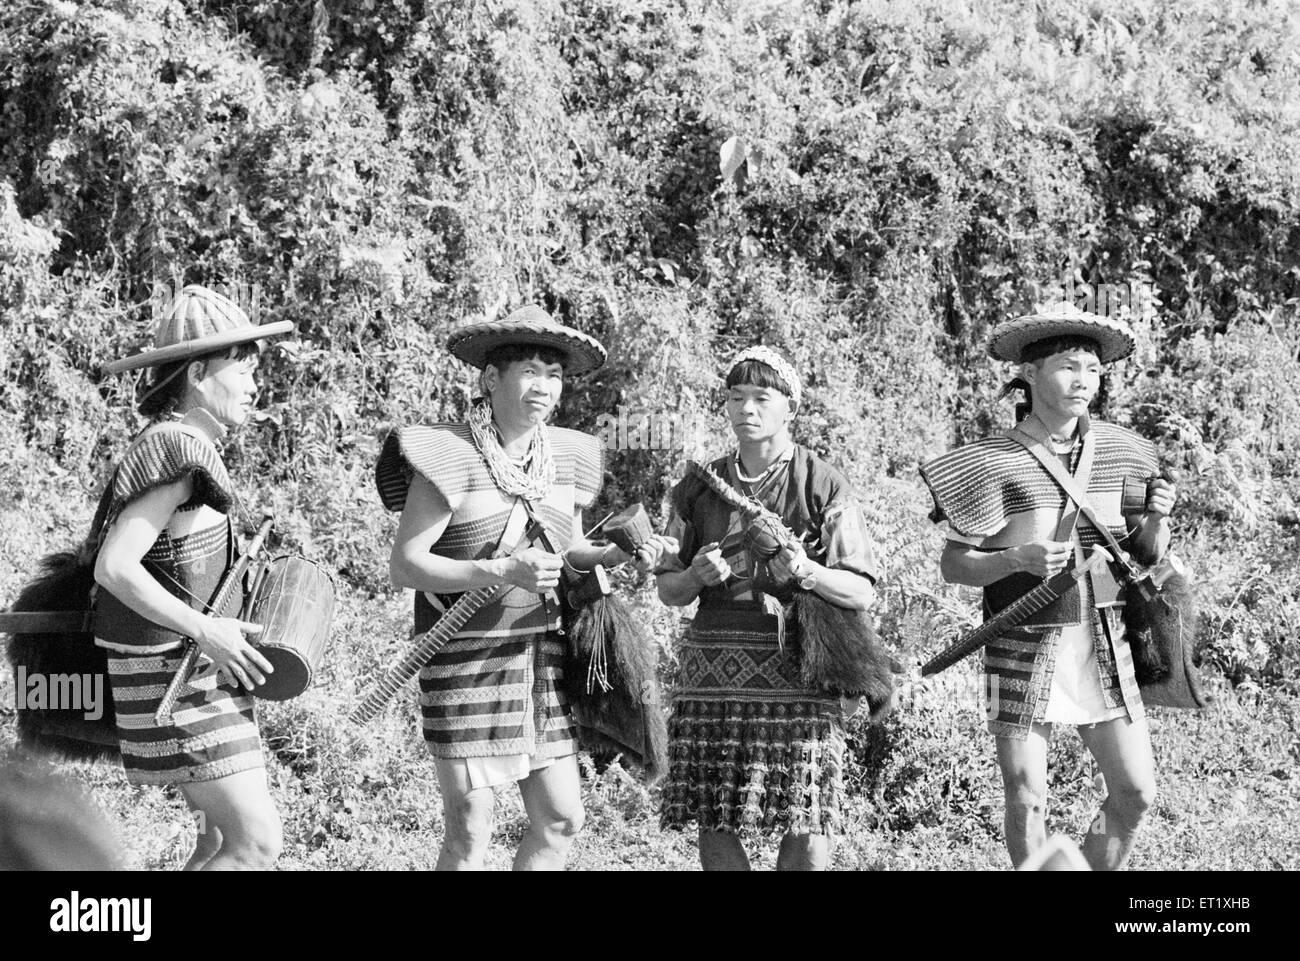 Hill Miri dancers in their traditional attire at Subansiri ; Arunachal Pradesh 1982 ; India - Stock Image